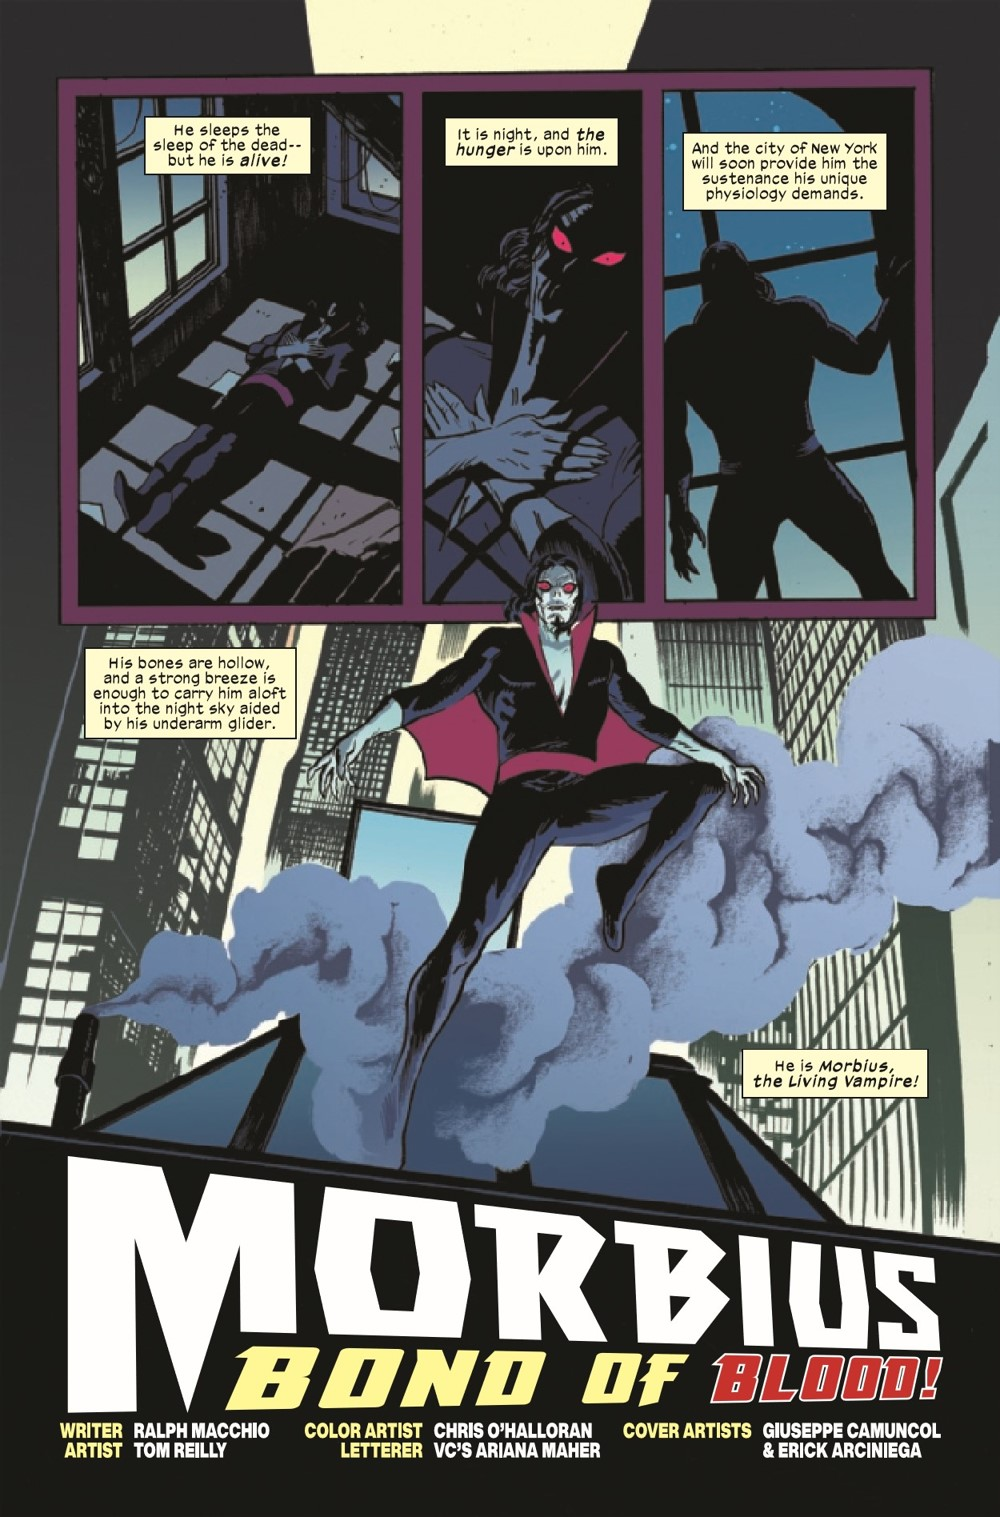 MORBIUSBOB2021001_Preview-2 ComicList Previews: MORBIUS BOND OF BLOOD #1